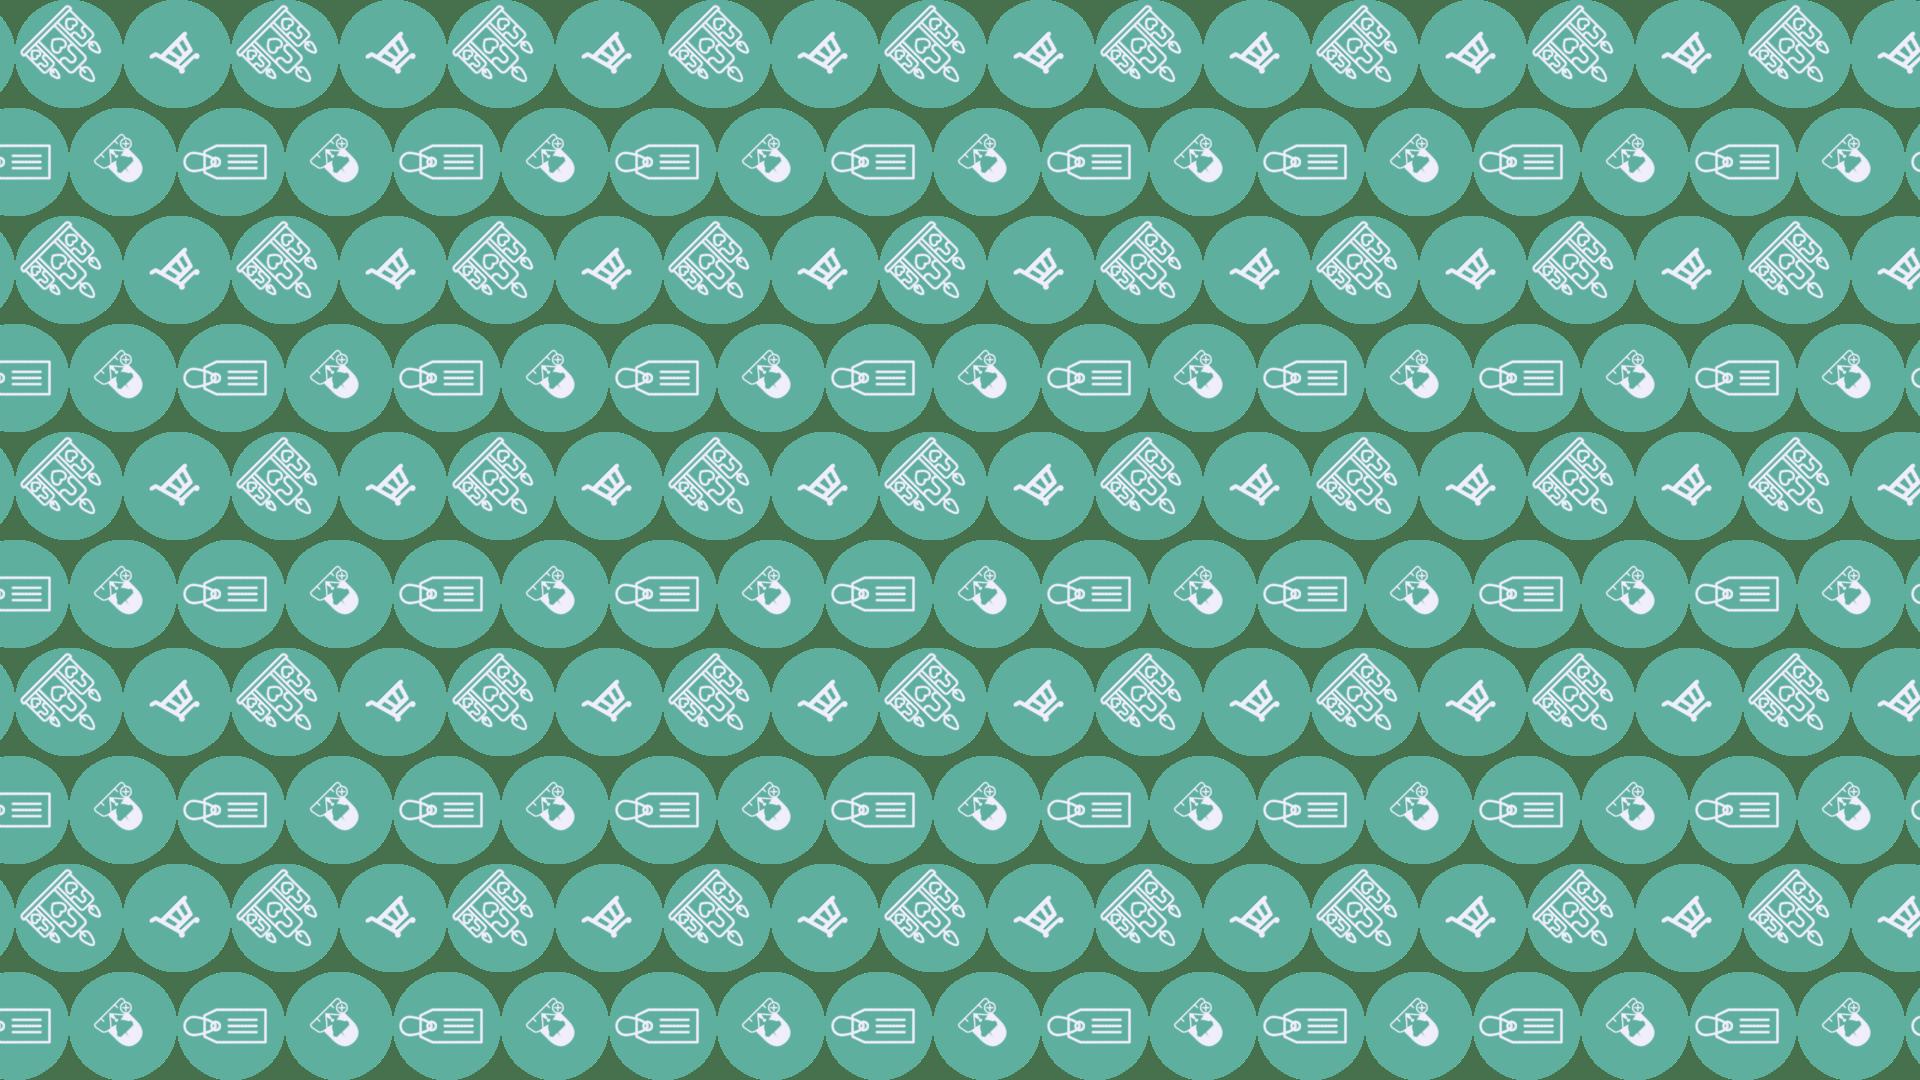 Blue, Green, Aqua, Pattern, Turquoise, Teal, Azure, Line, Design, Circle, Button, Carts, Label,  Free Image